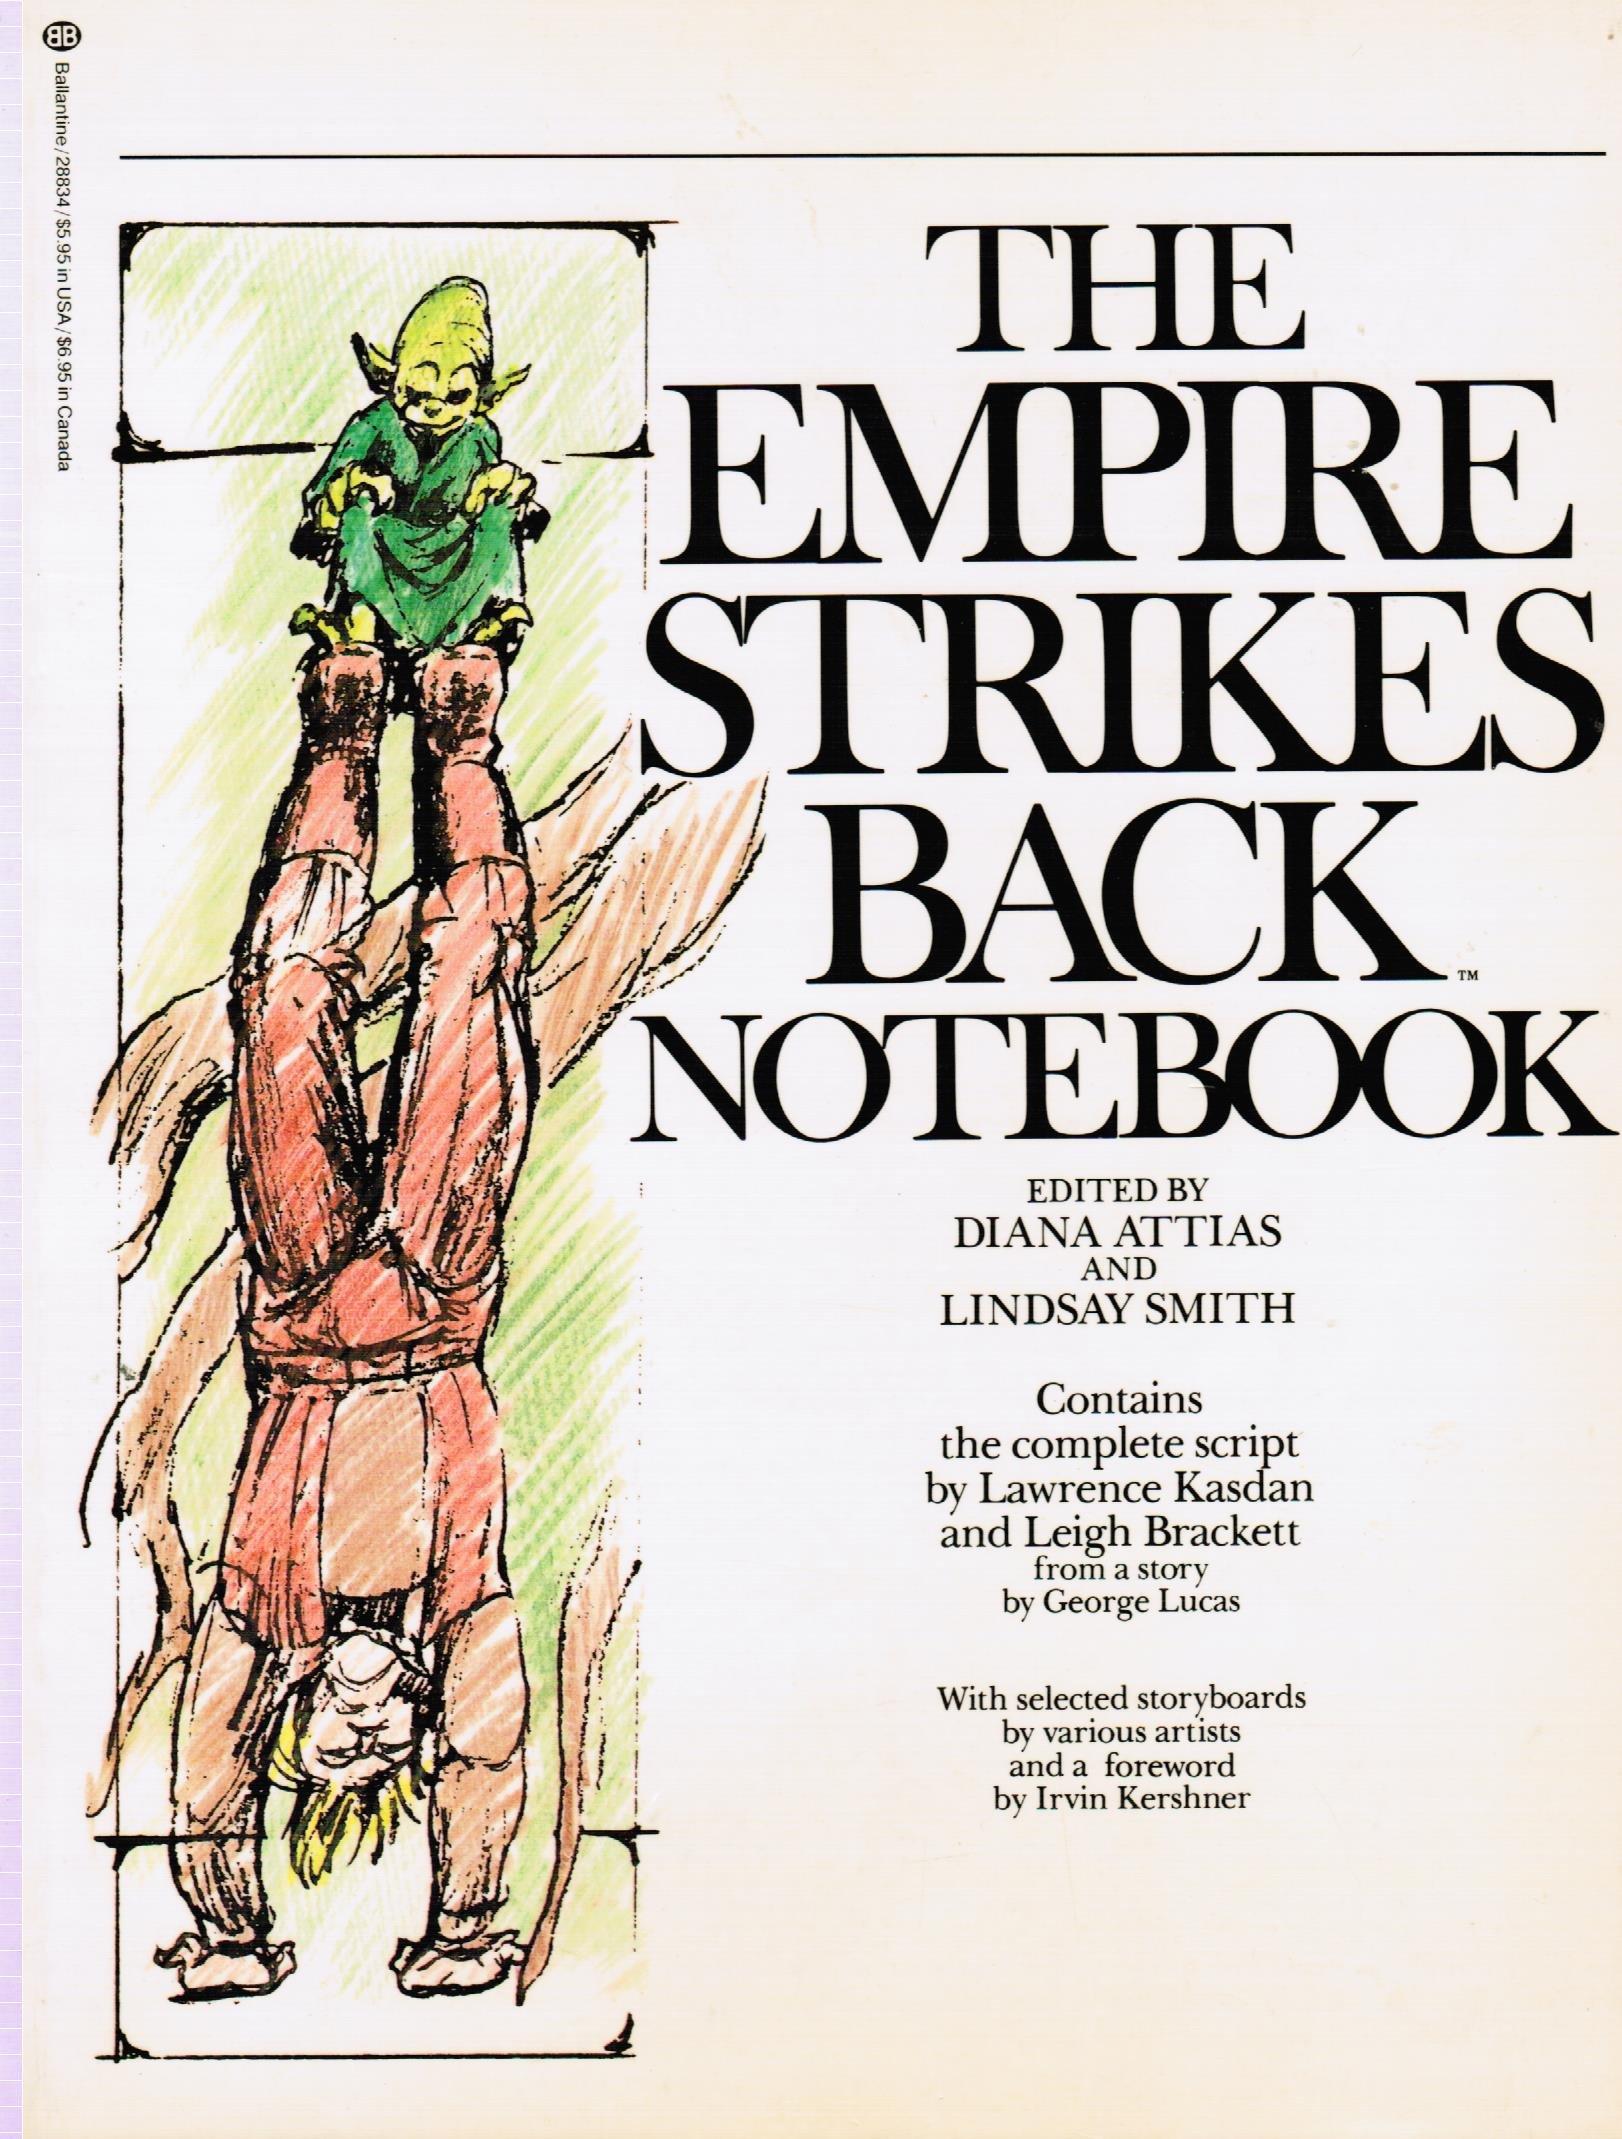 Star Wars Episode V: The Empire Strikes Back Screenplay